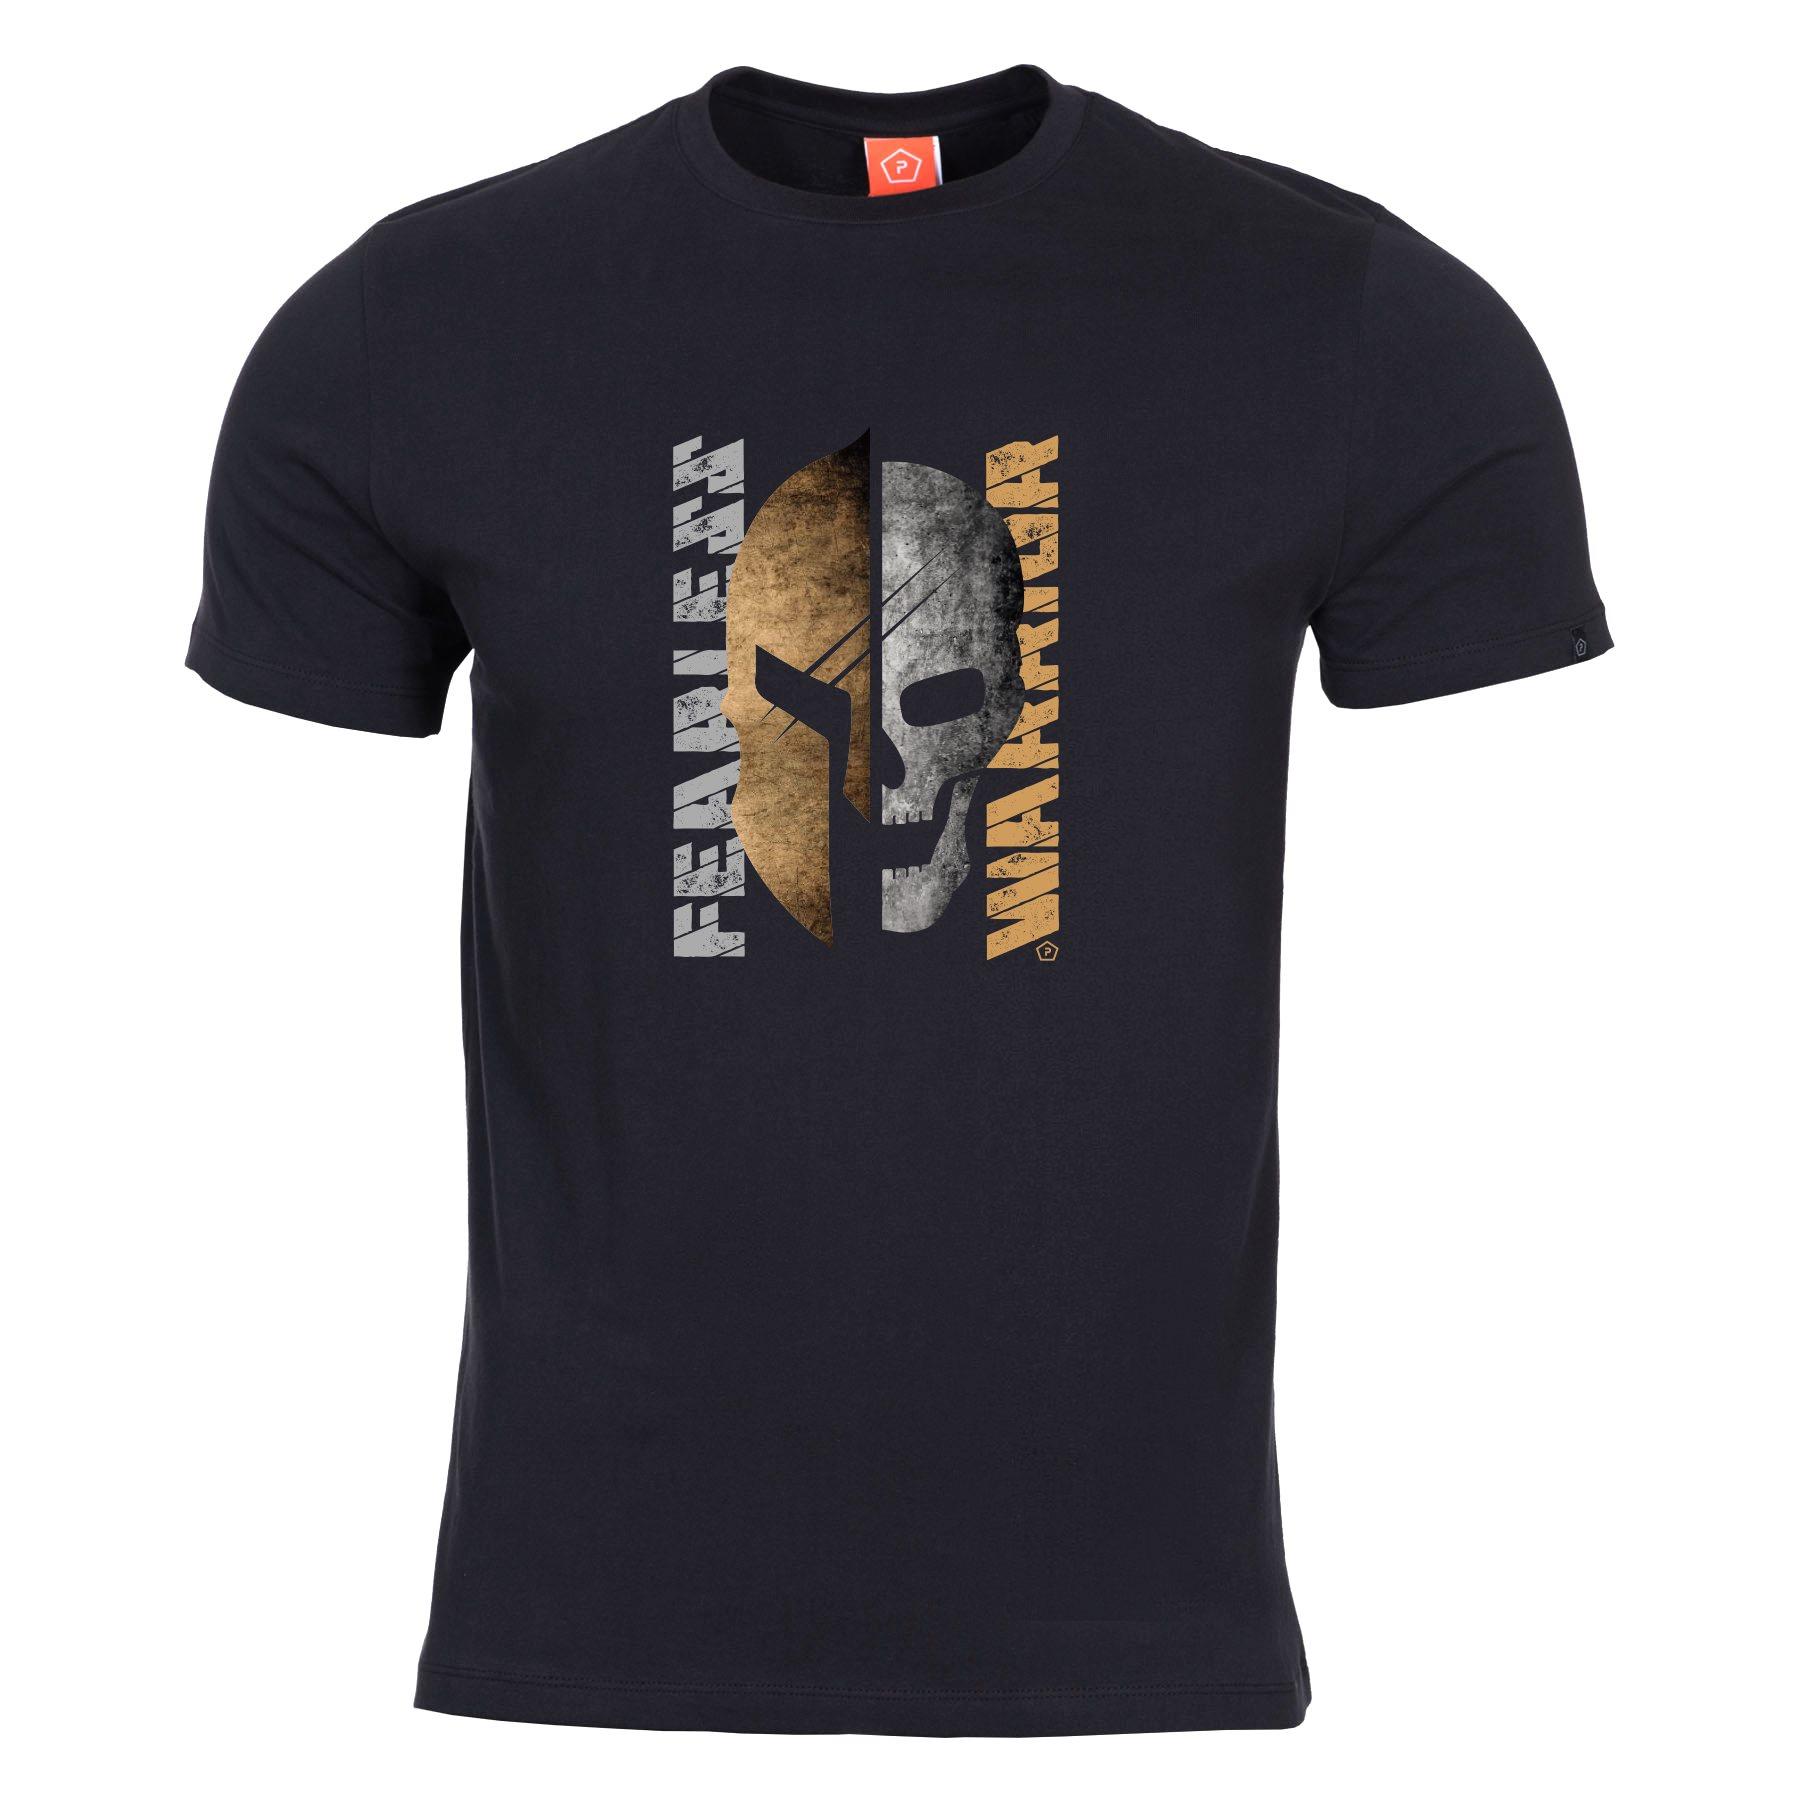 T-shirt FEARLESS WARRIOR BLACK PENTAGON K09012-FE-01 L-11